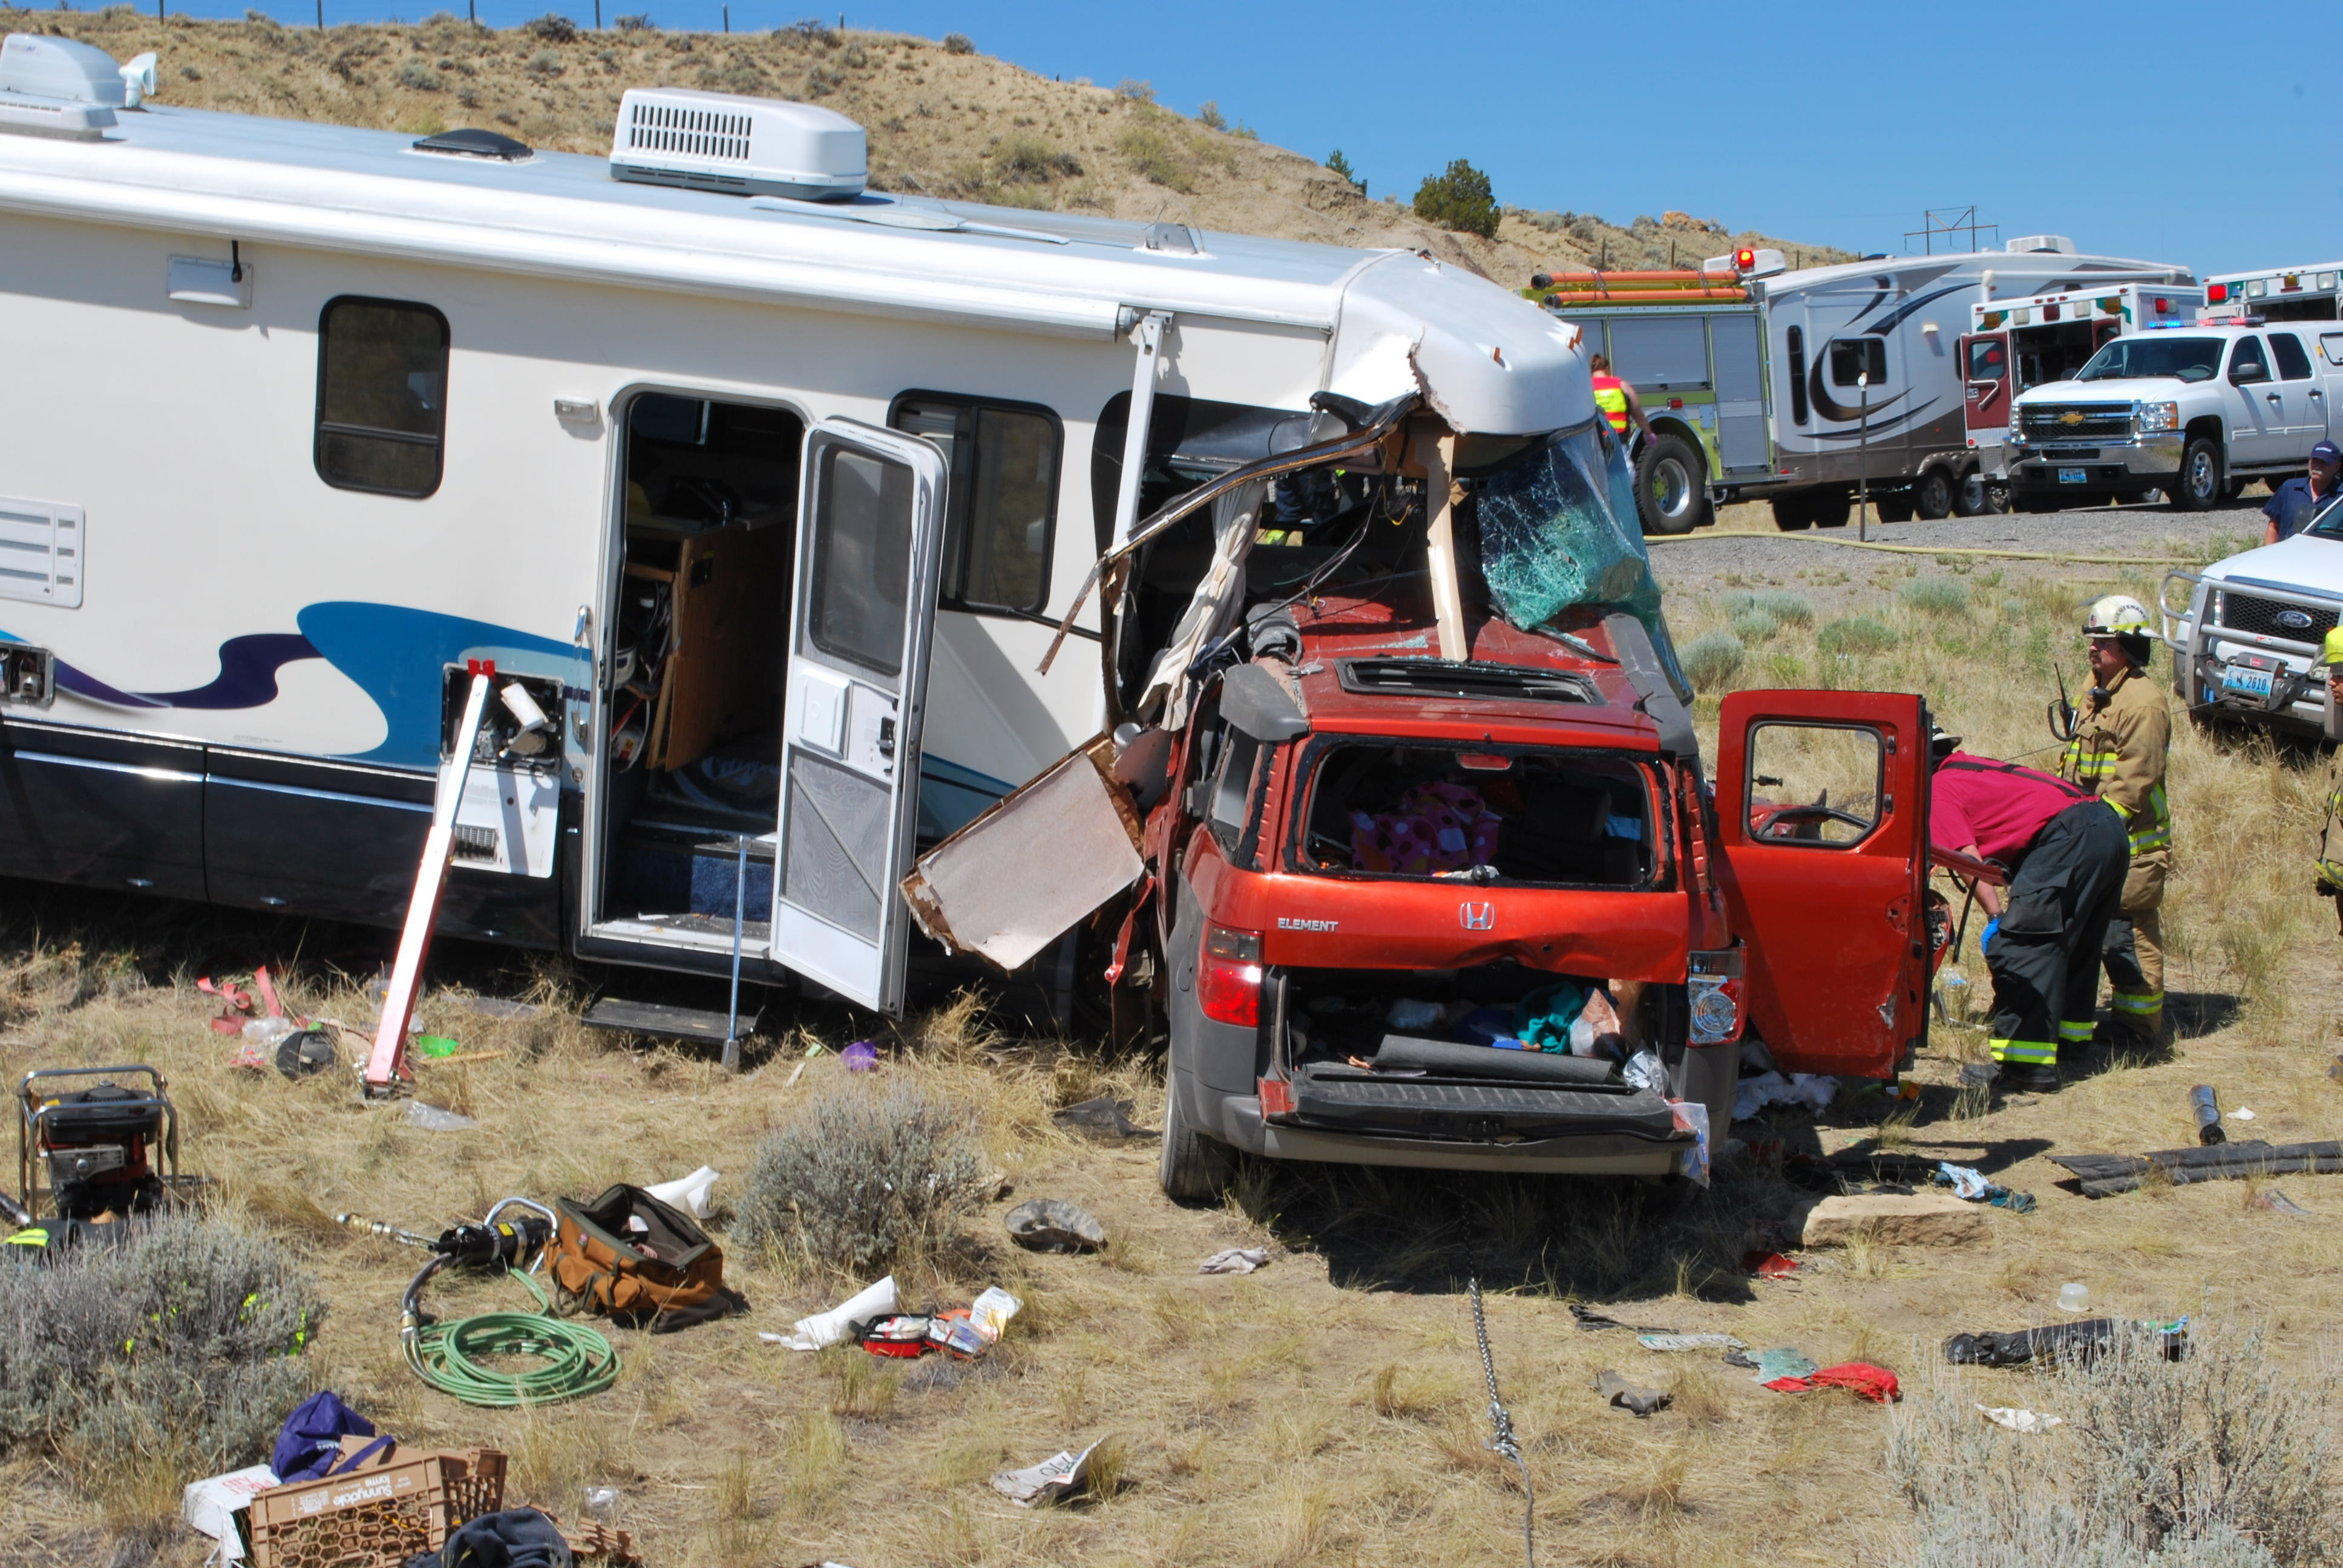 head on motorhome crash involving an SUV